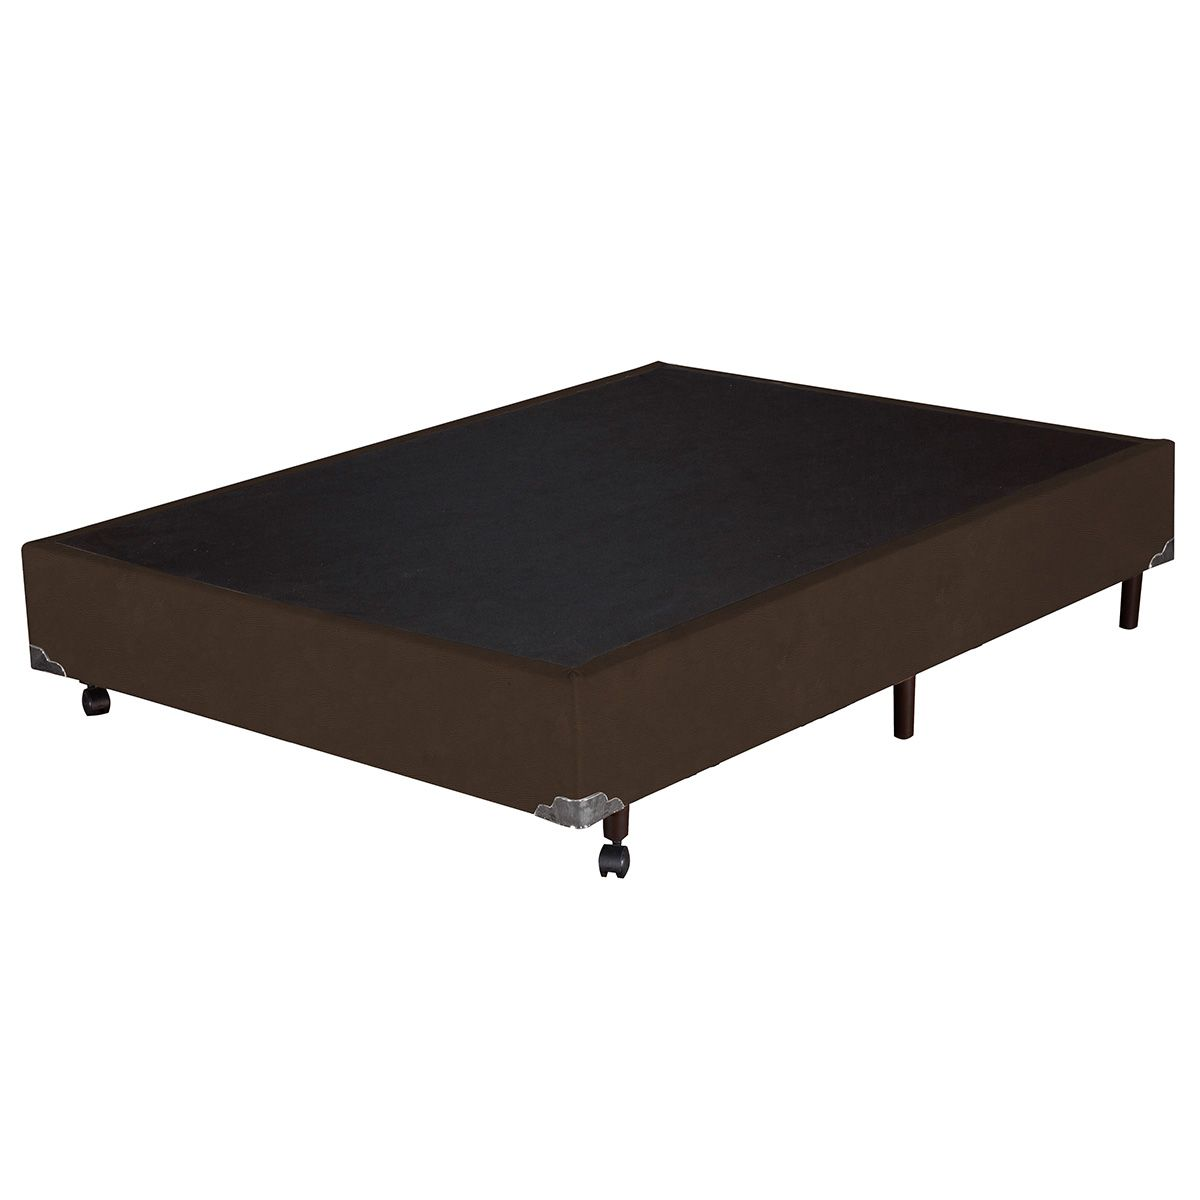 Base Box Casal Corino Marrom 138x188x37 cm